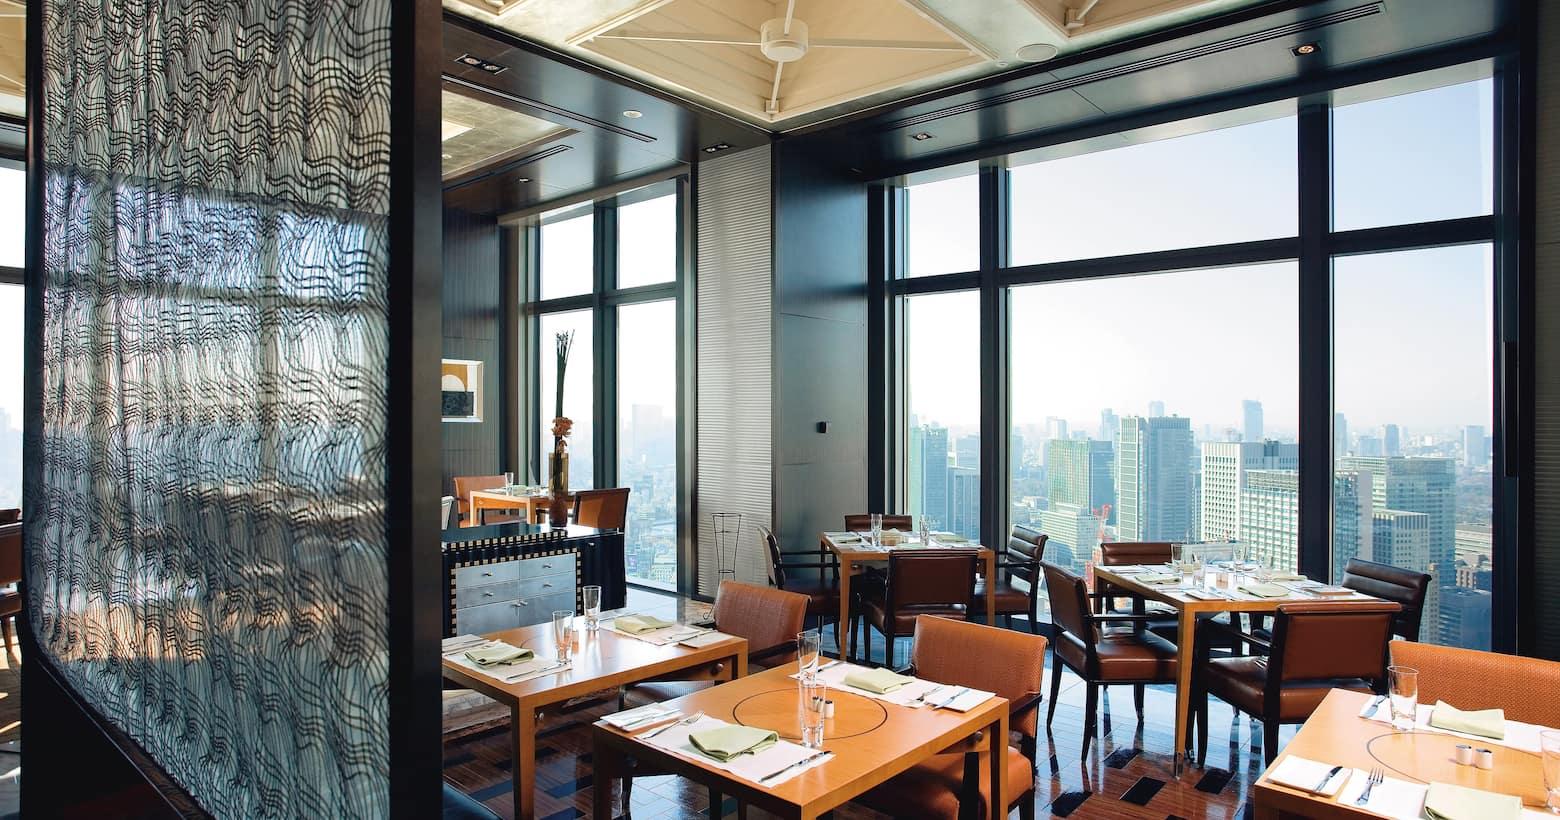 K'shiki dining area